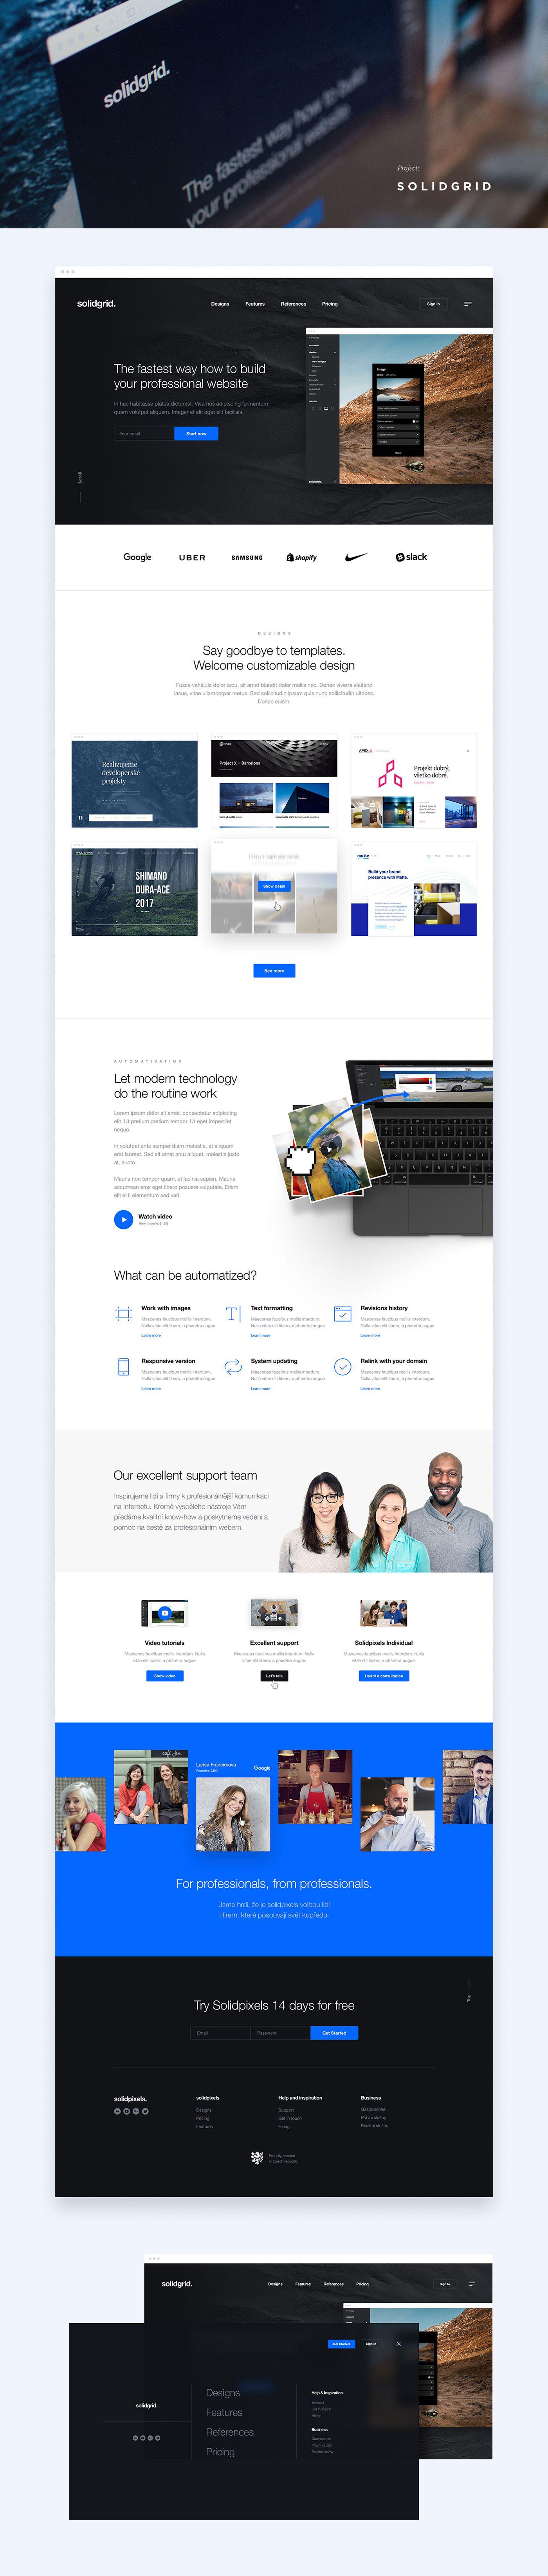 Selected Web Designs 2016 2017 On Behance Business Web Design Dribbble Design Web Design User Experience